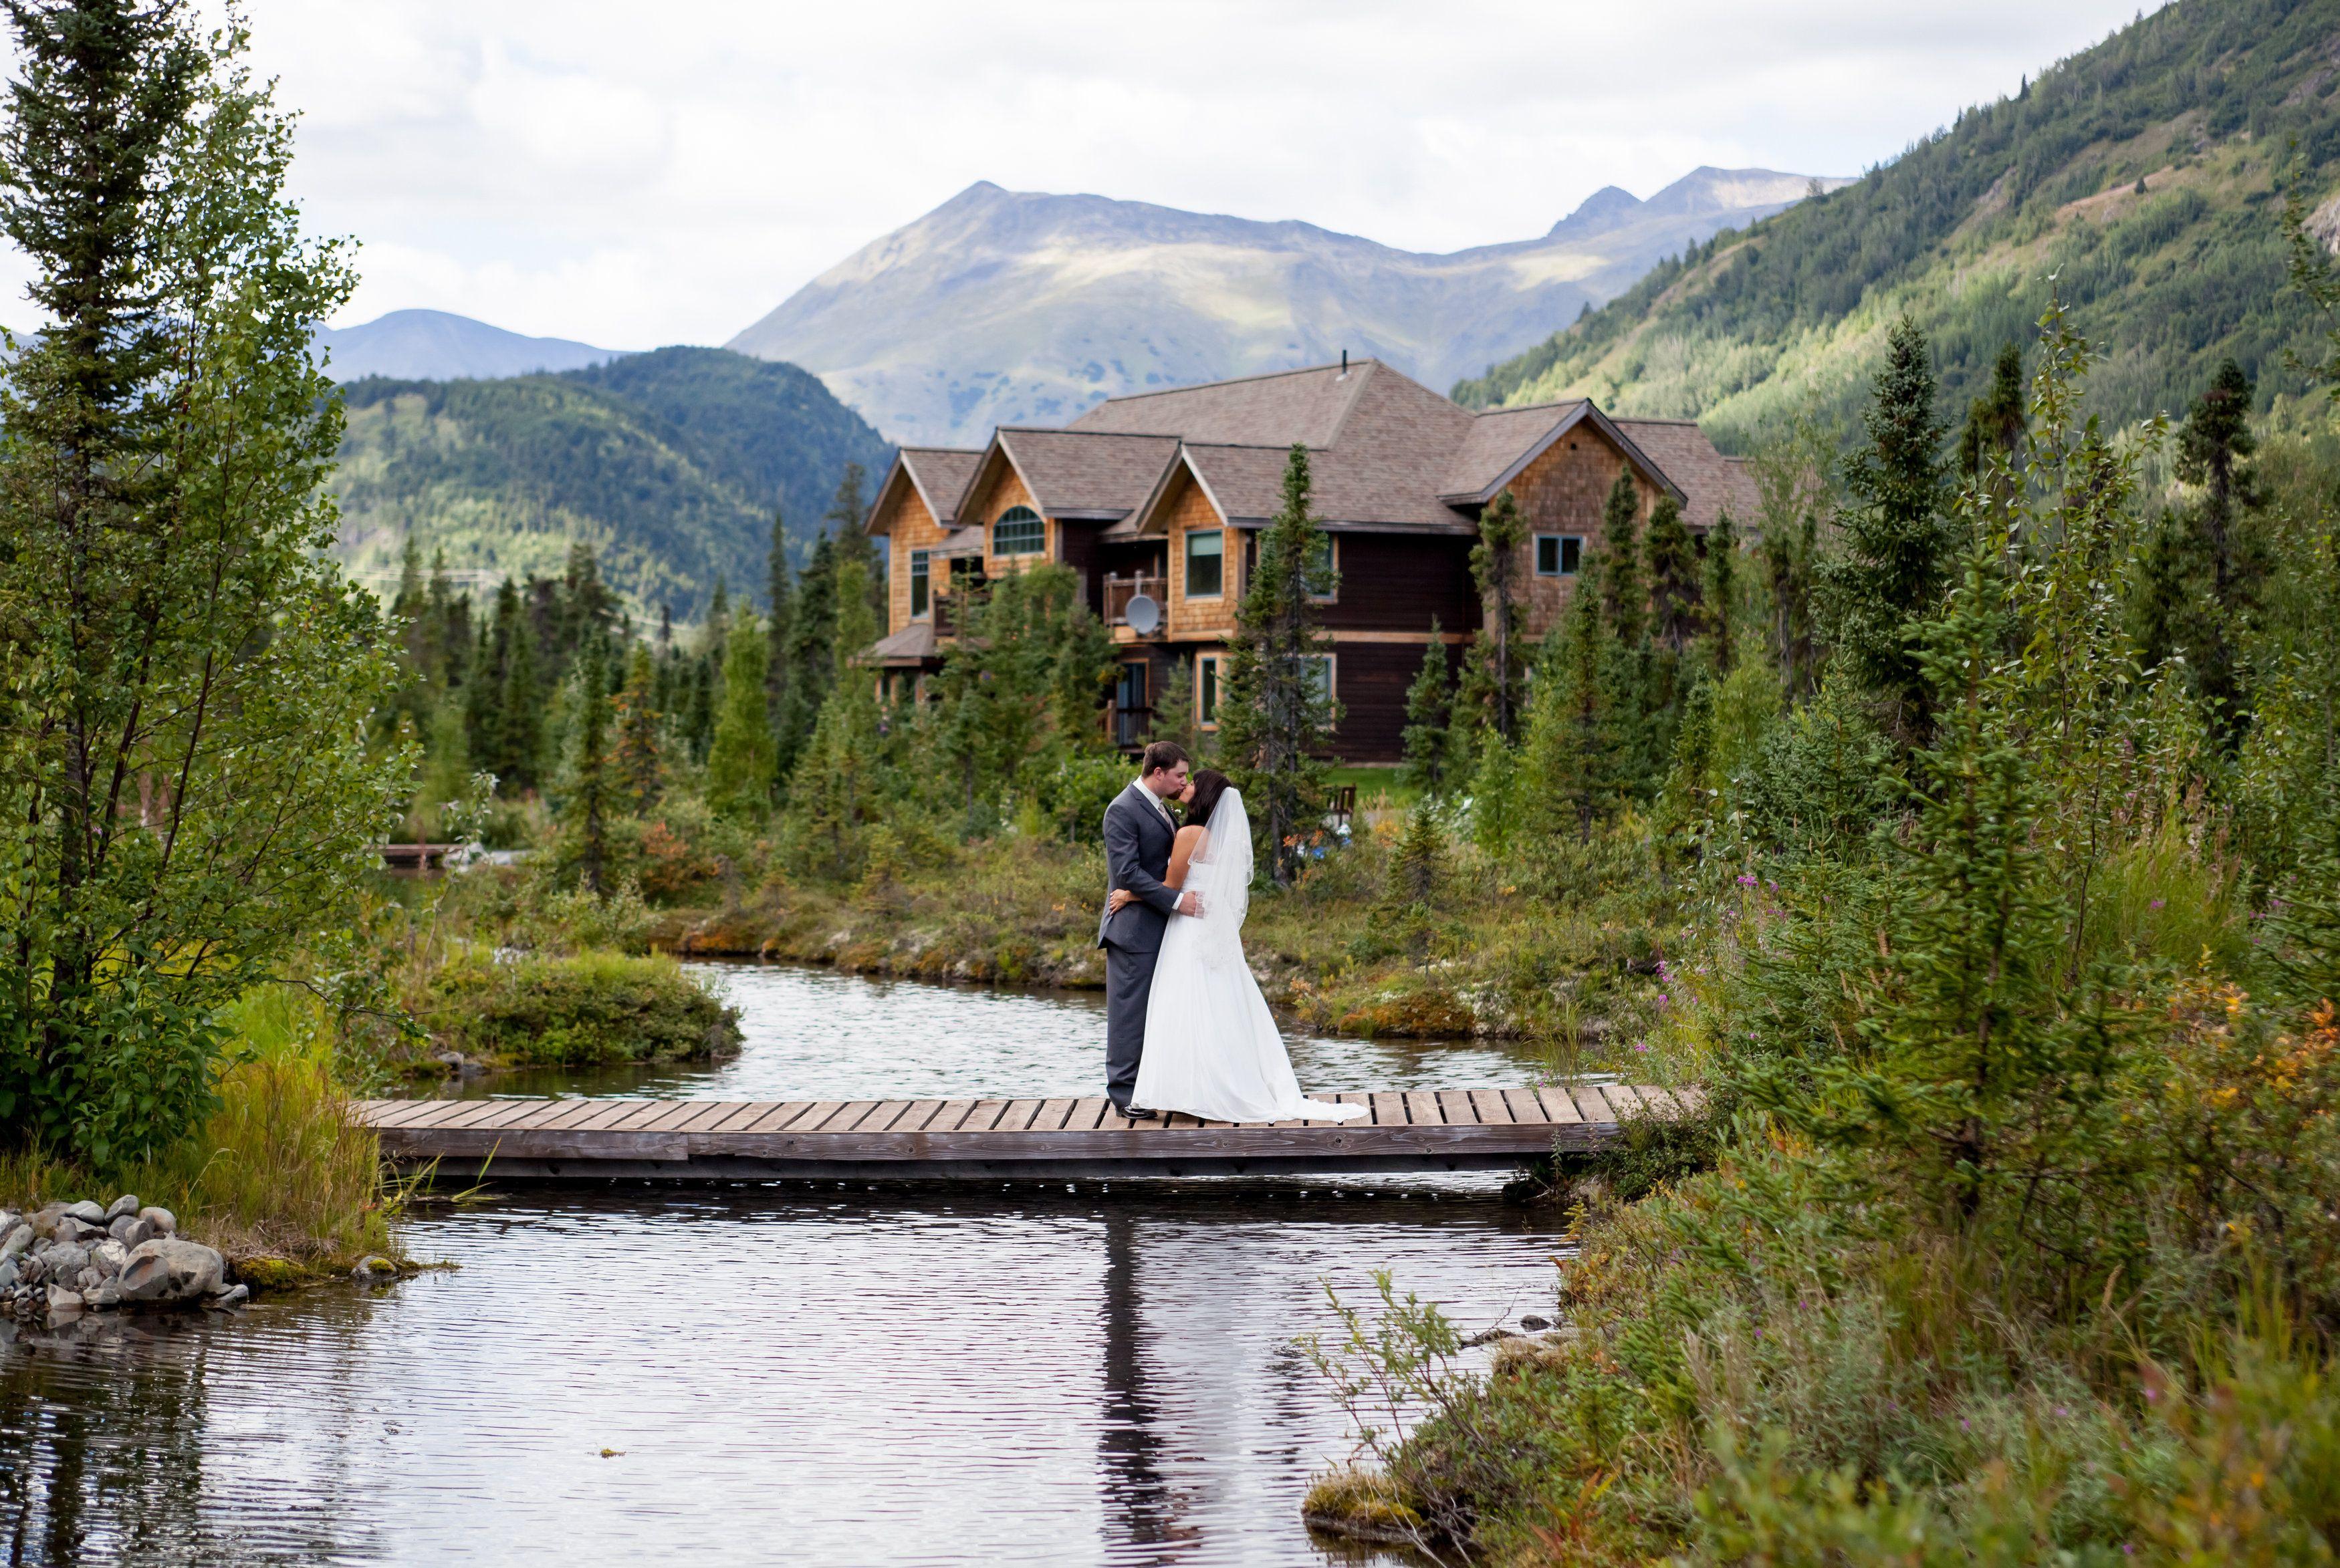 Wedding At Bis Beach In Homer Alaska Destination Don Pitcher Alaskaweddings Destinationwedding Homeralaska Pinterest